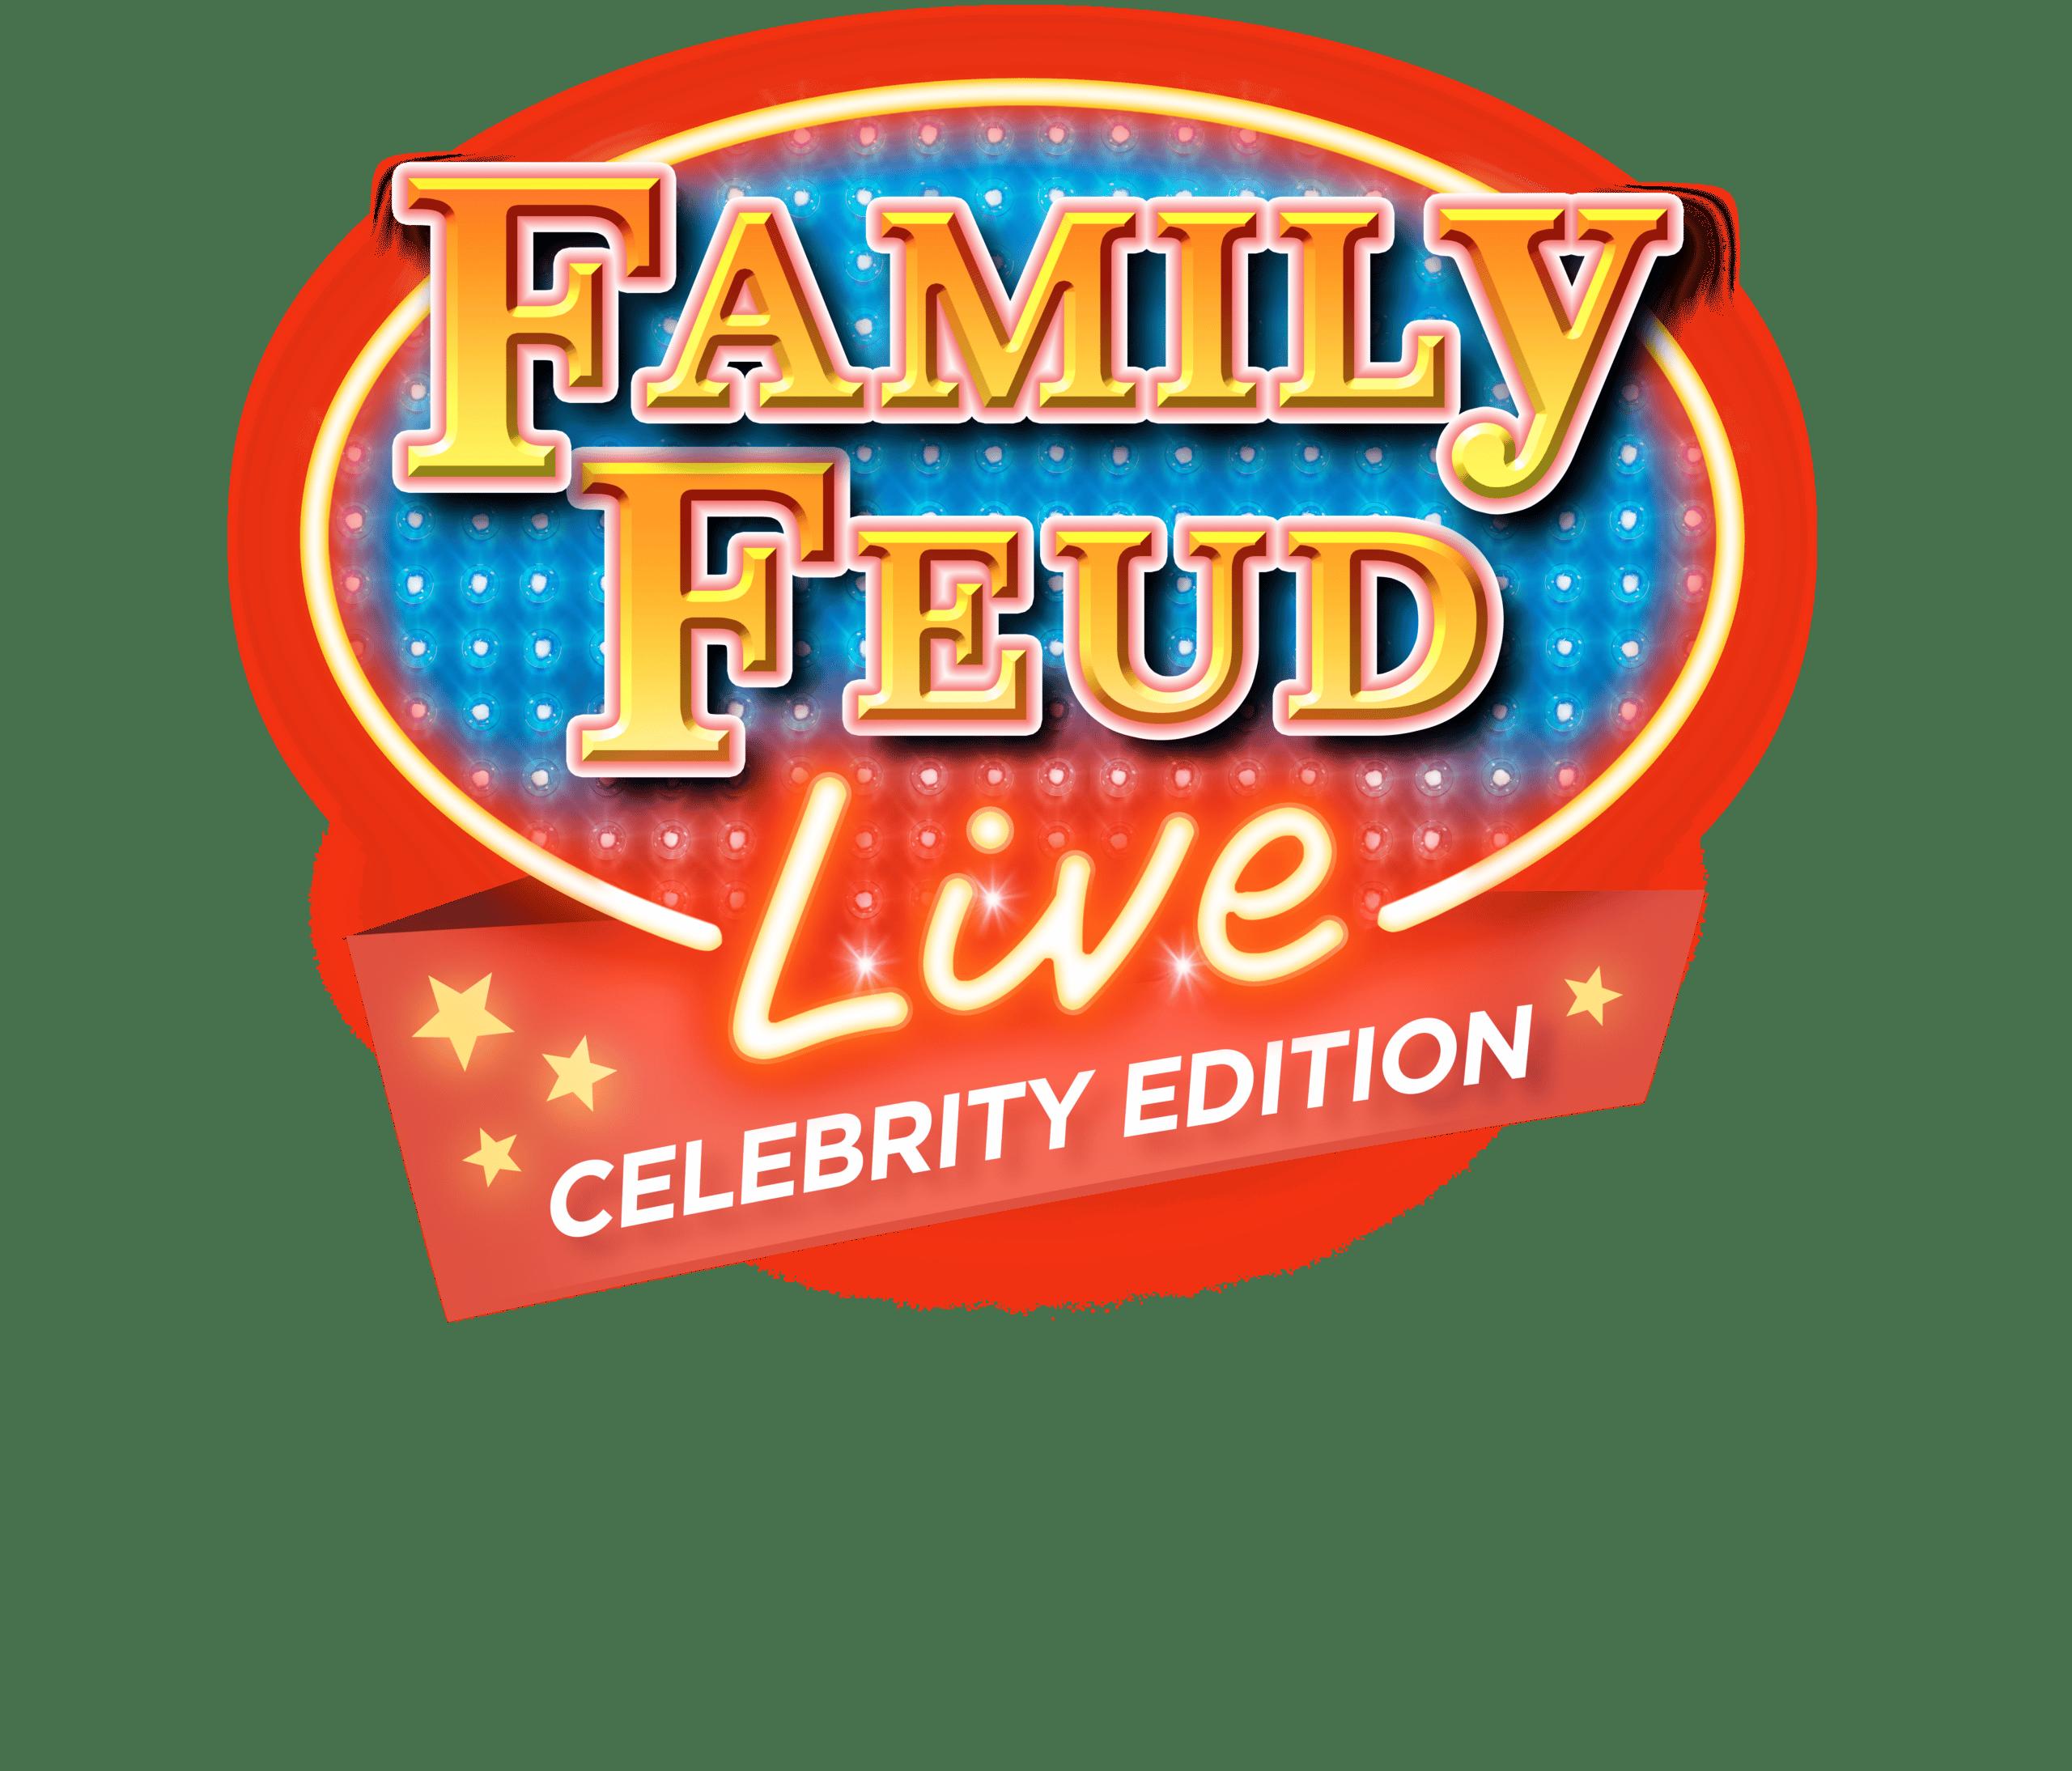 Family Feud Live: Celebrity Edition! Celebrities Pauly Shore, Chris Kattan & Host Rubin Ervin